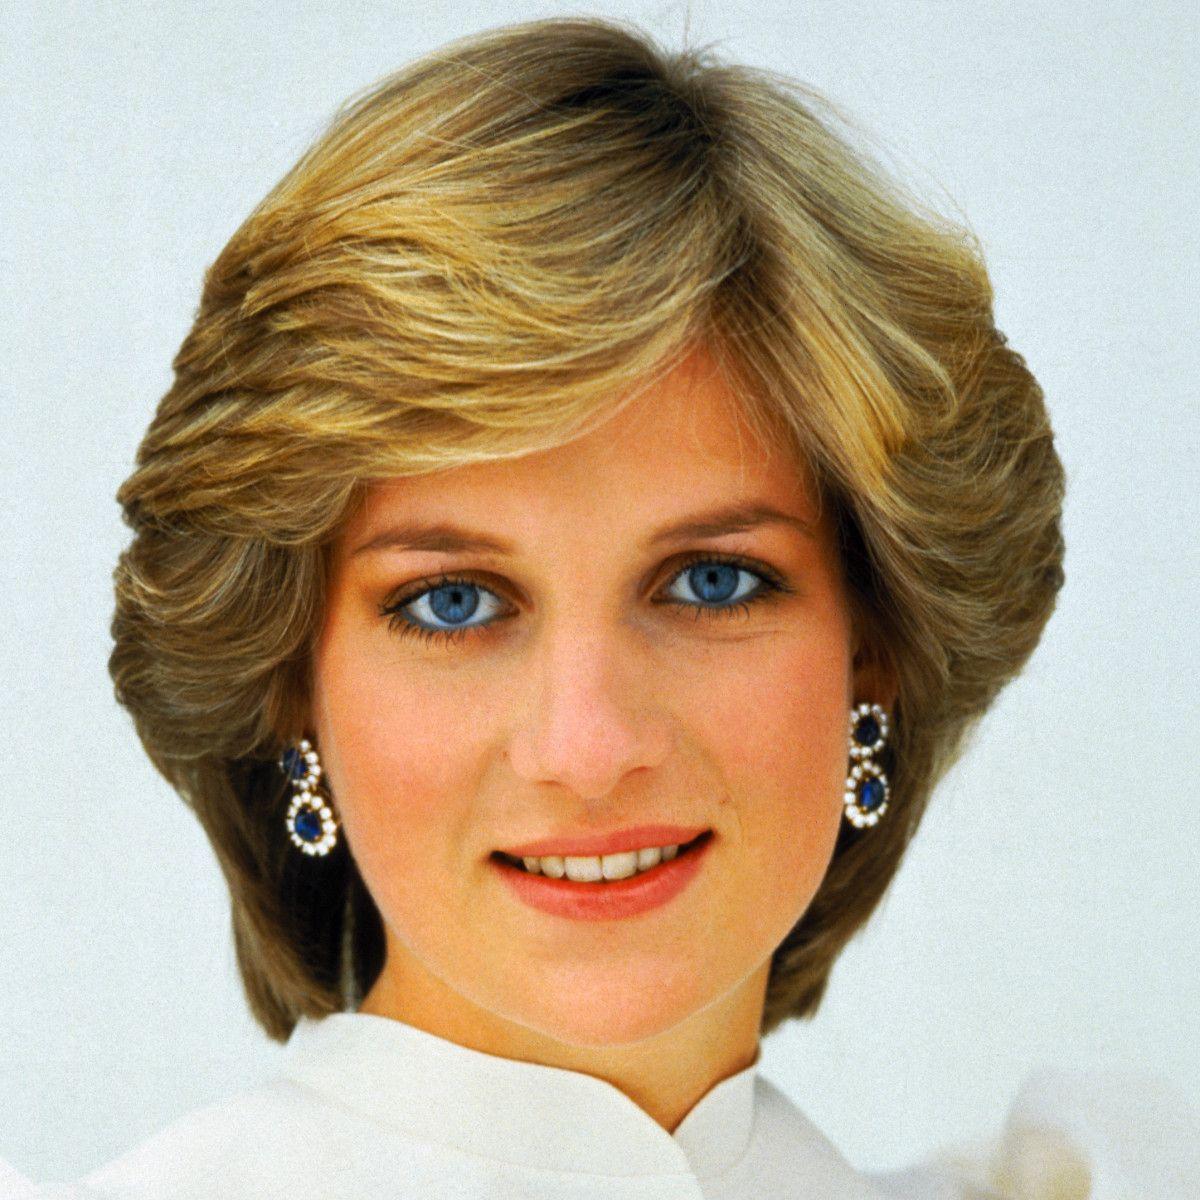 princess diana was princess of wales while married to prince